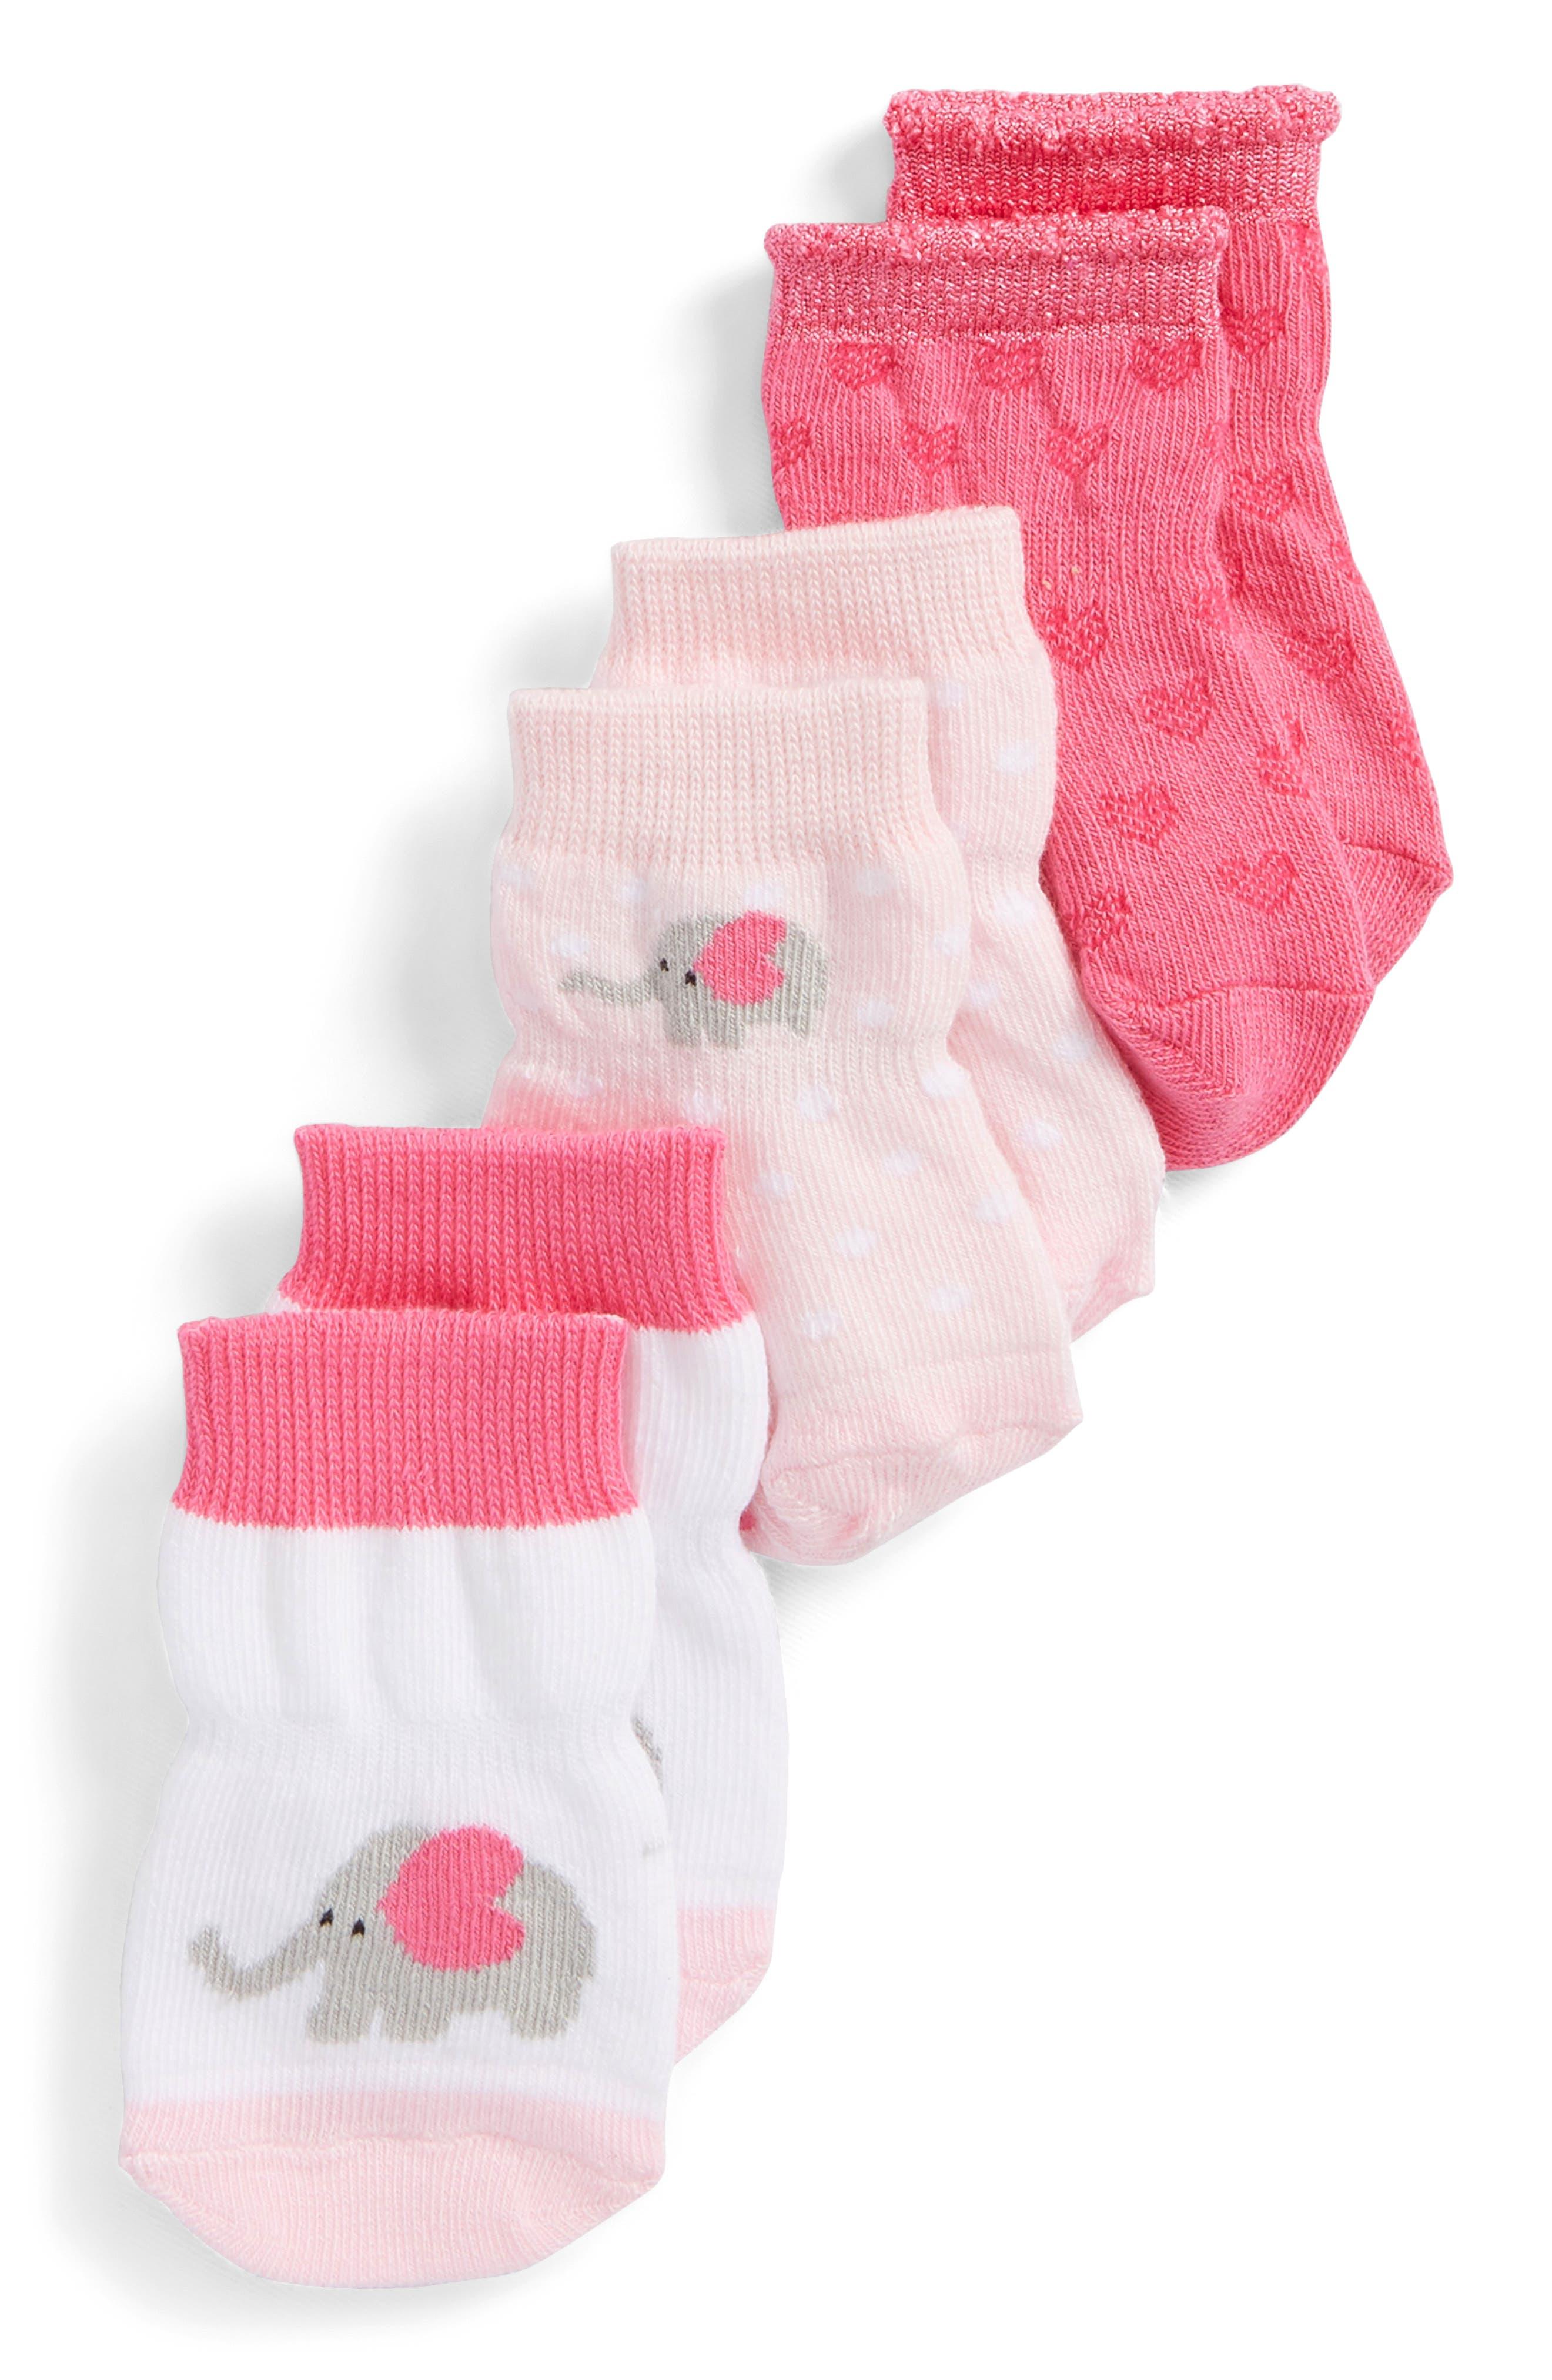 Toddler Girls Robeez Little Peanut 3Pack Socks Size 1224months  Pink